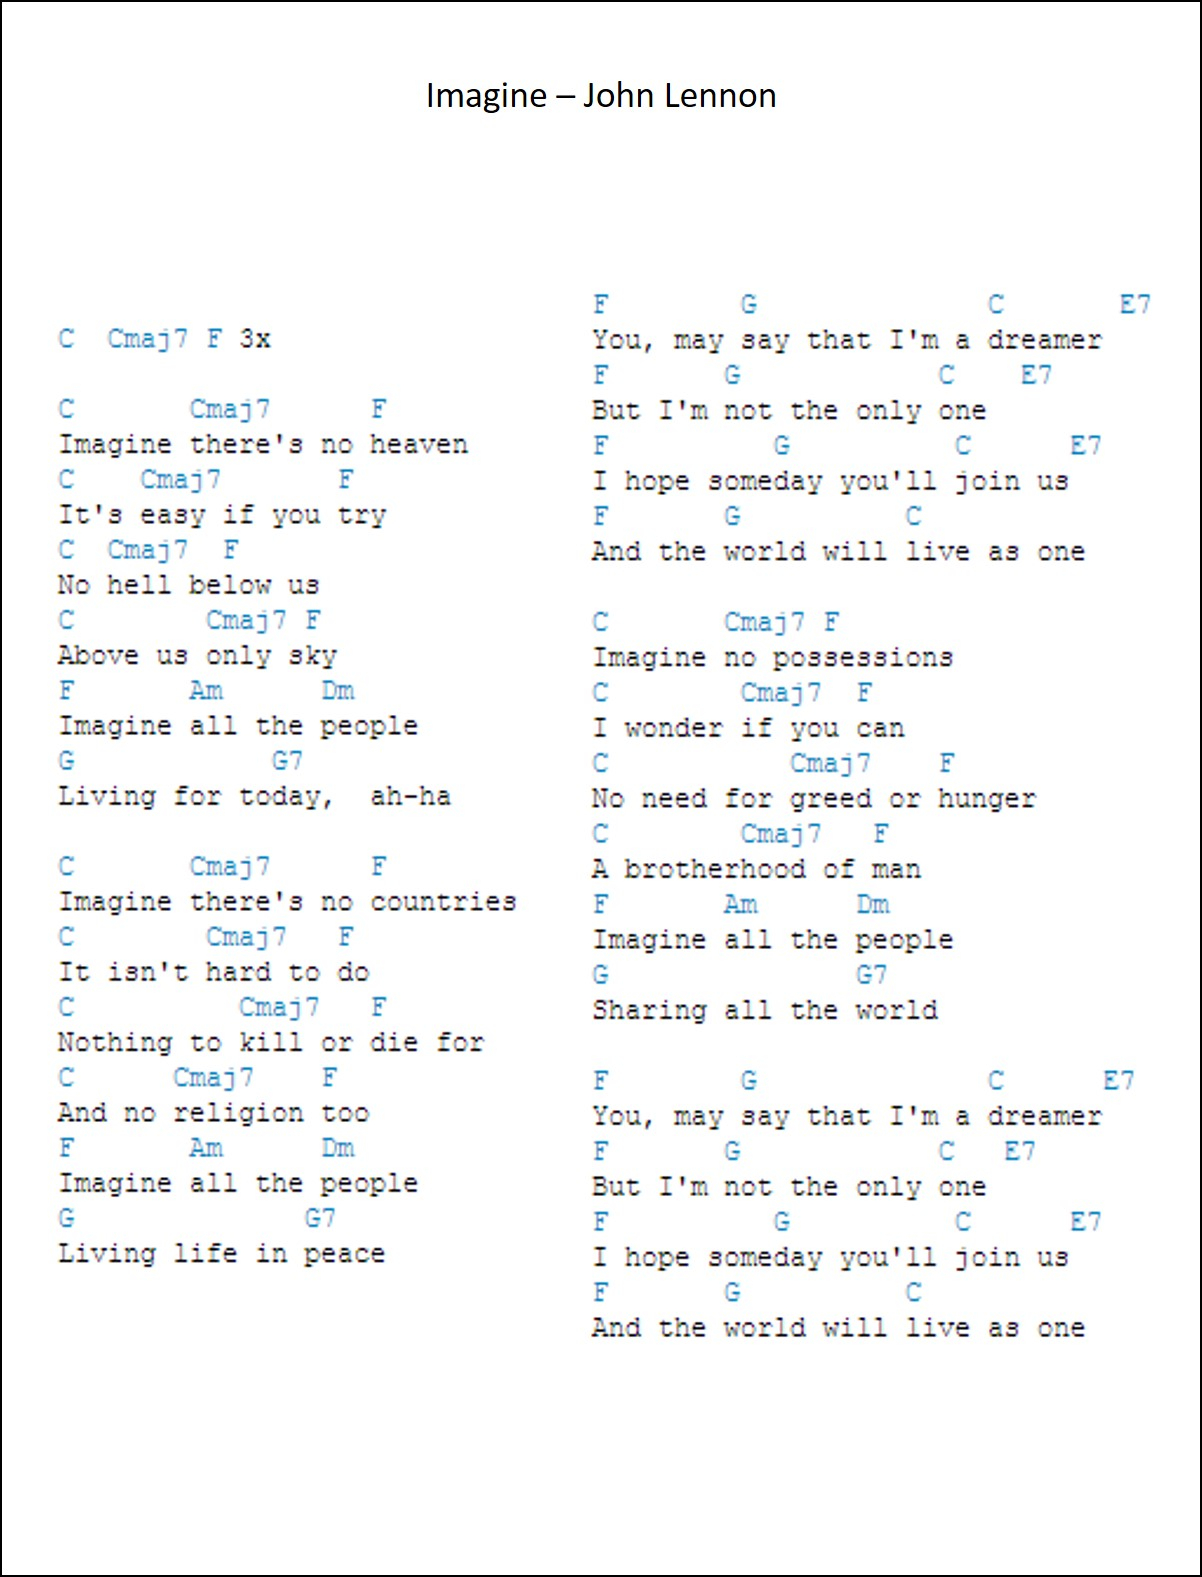 I Can Only Imagine Chords Guitar Gear Reviews Imagine Chords And Lyrics John Lennnon